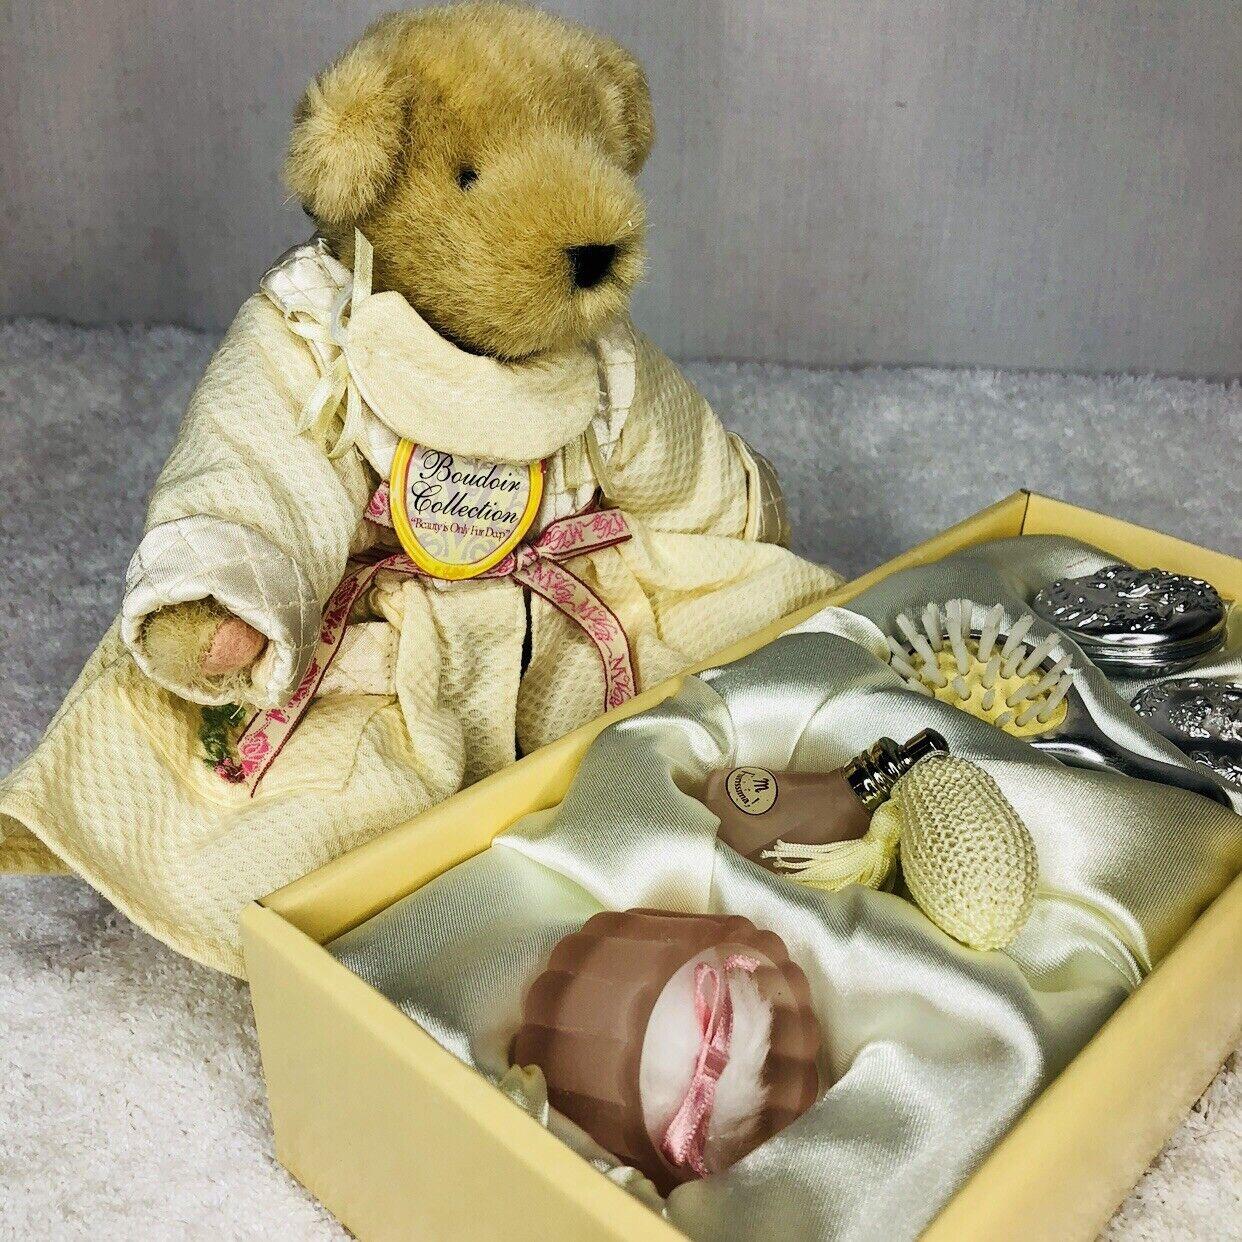 Vintage 1994 Muffy Vanderbear Collection Boudoir Vanity Accessories New in Box